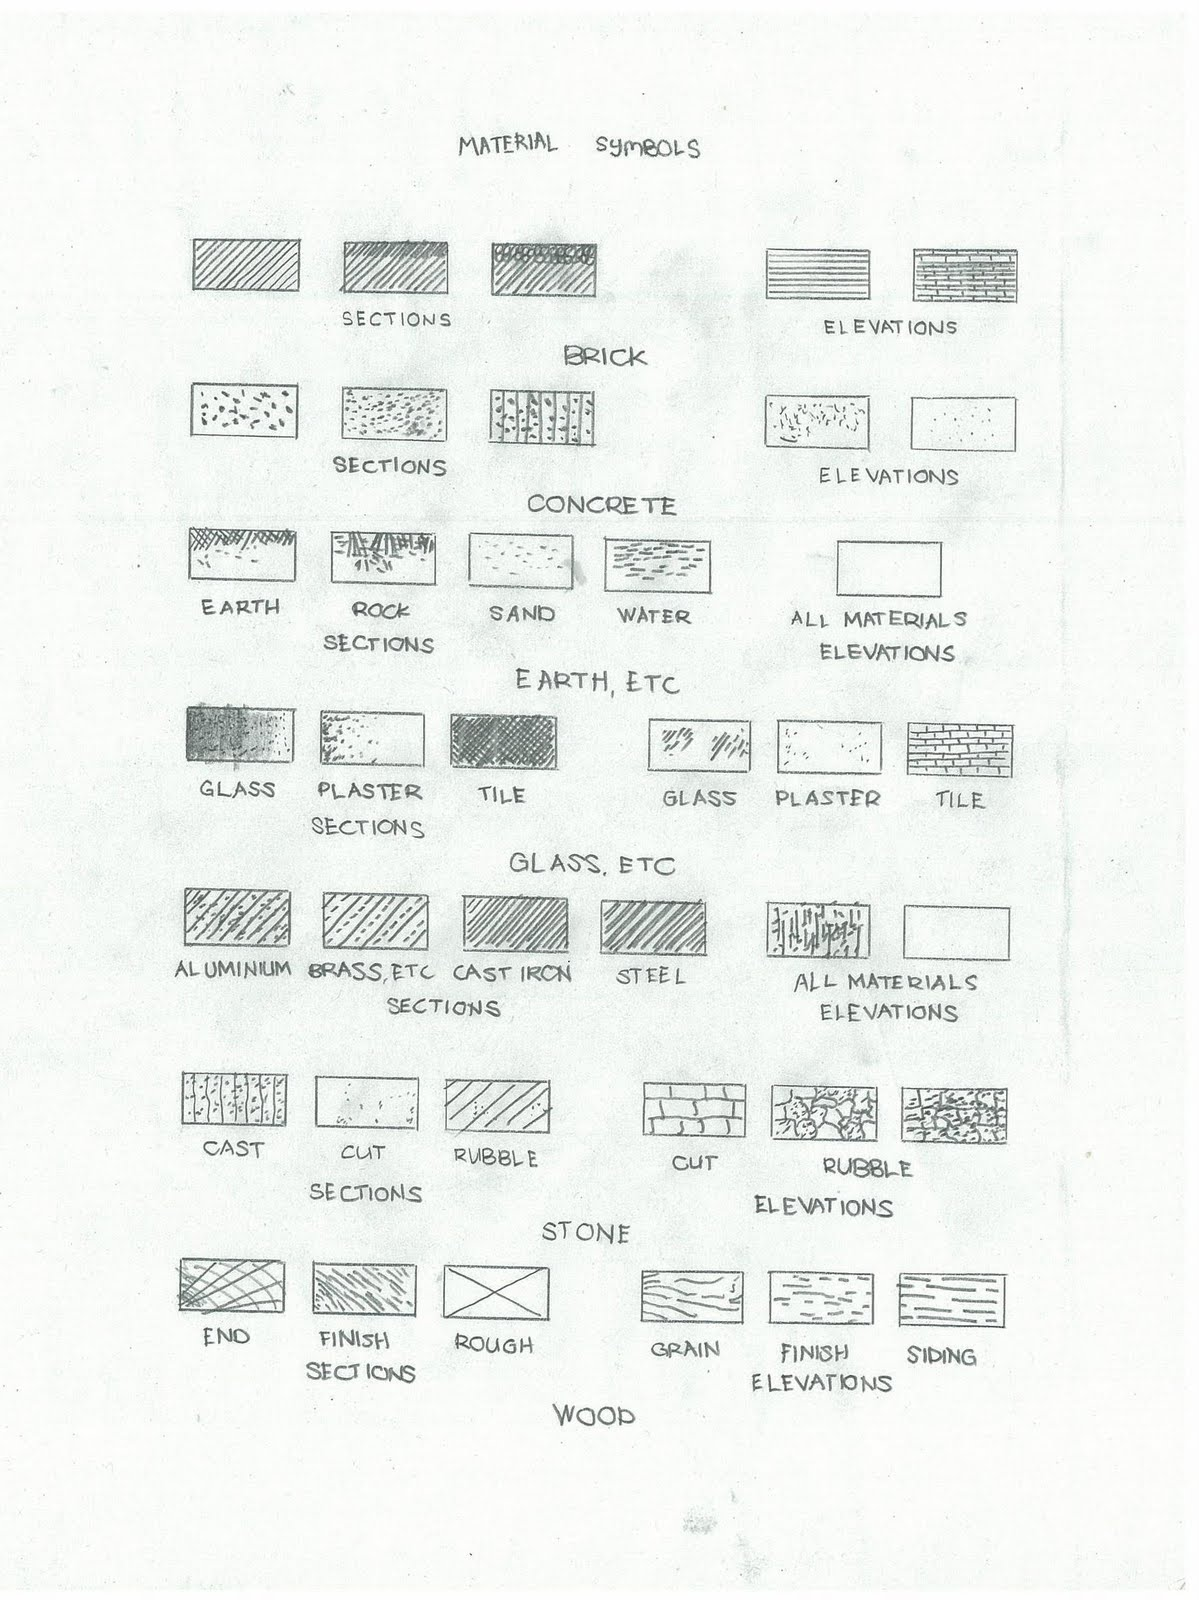 Design visualization sj04b architectural symbols sj04b architectural symbols biocorpaavc Choice Image